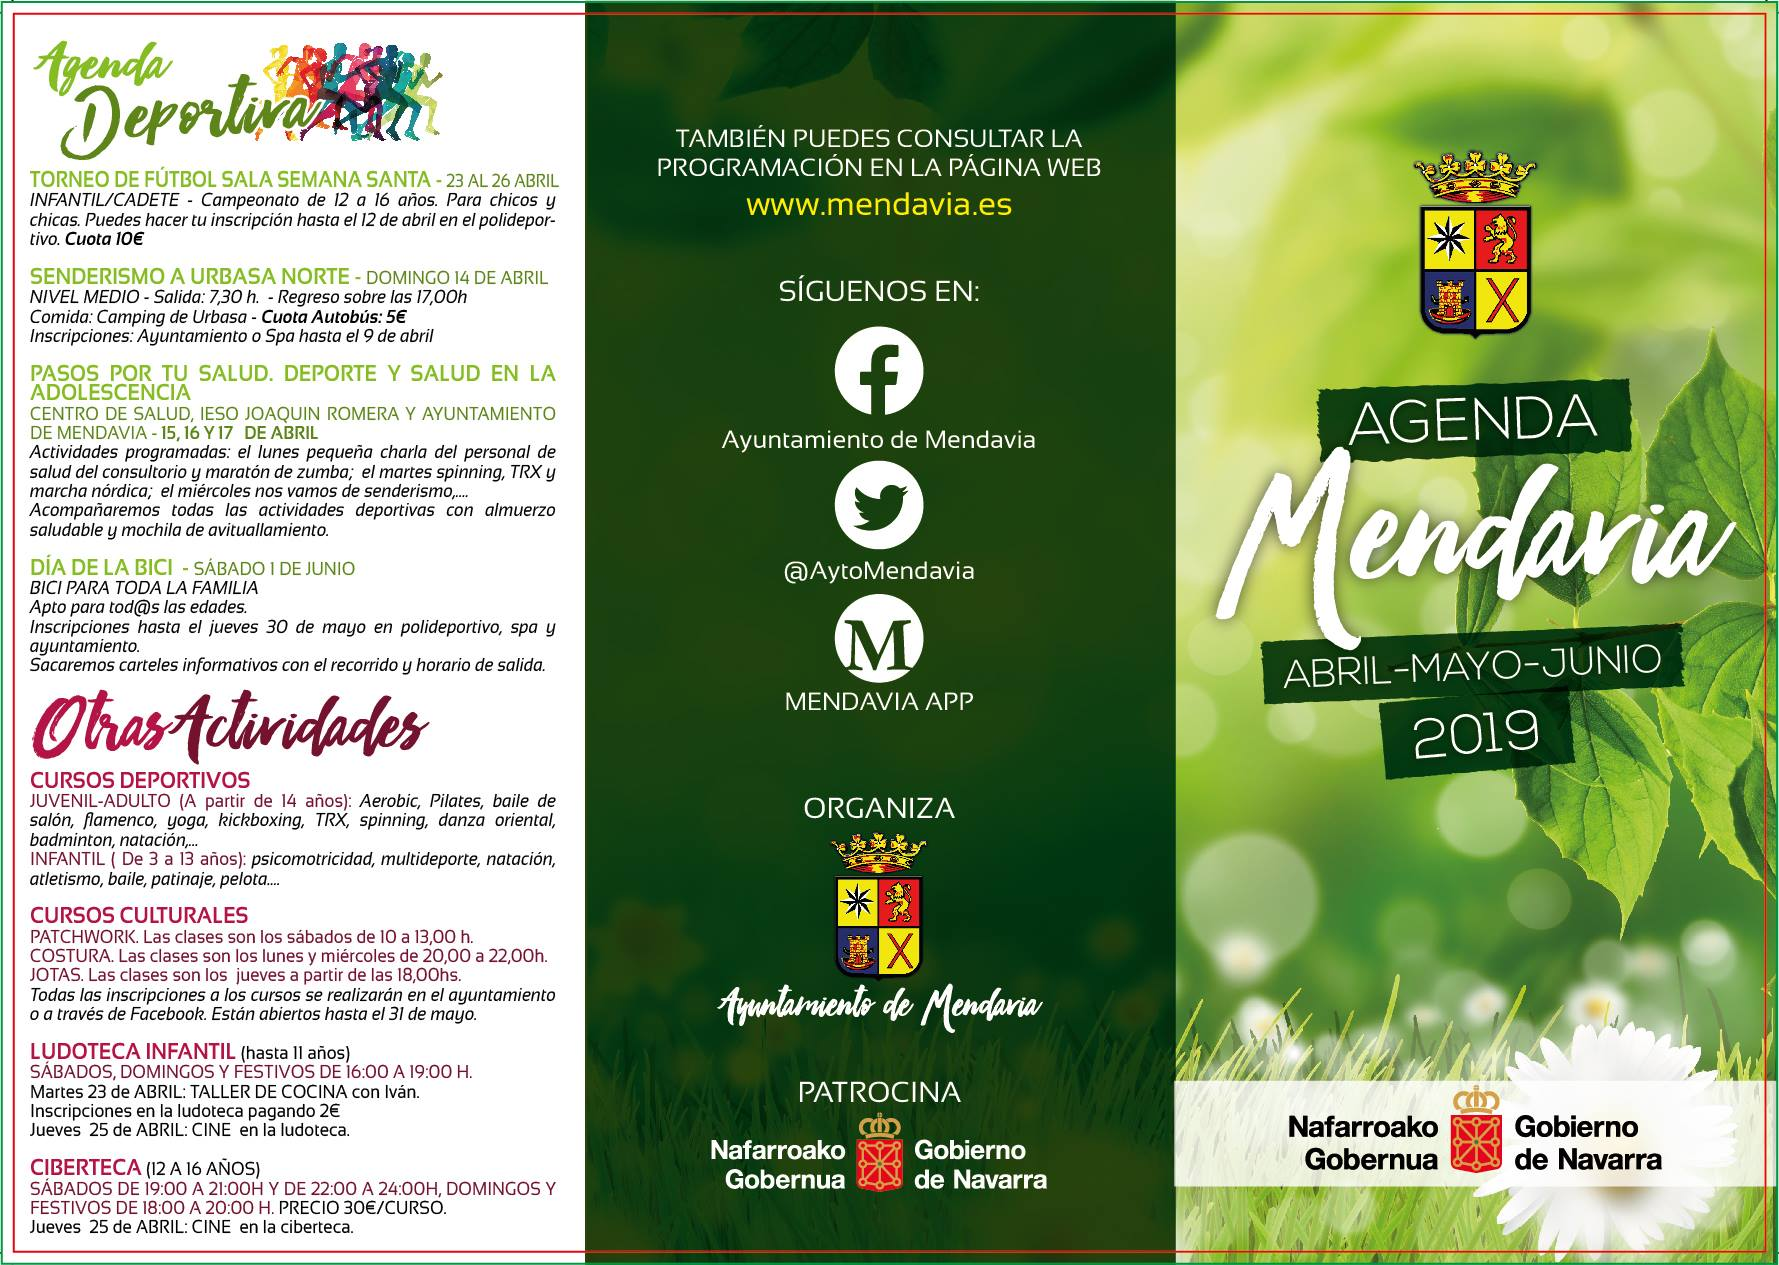 Agenda Abril-Mayo-Junio 2019 - Mendavia (Navarra) 1